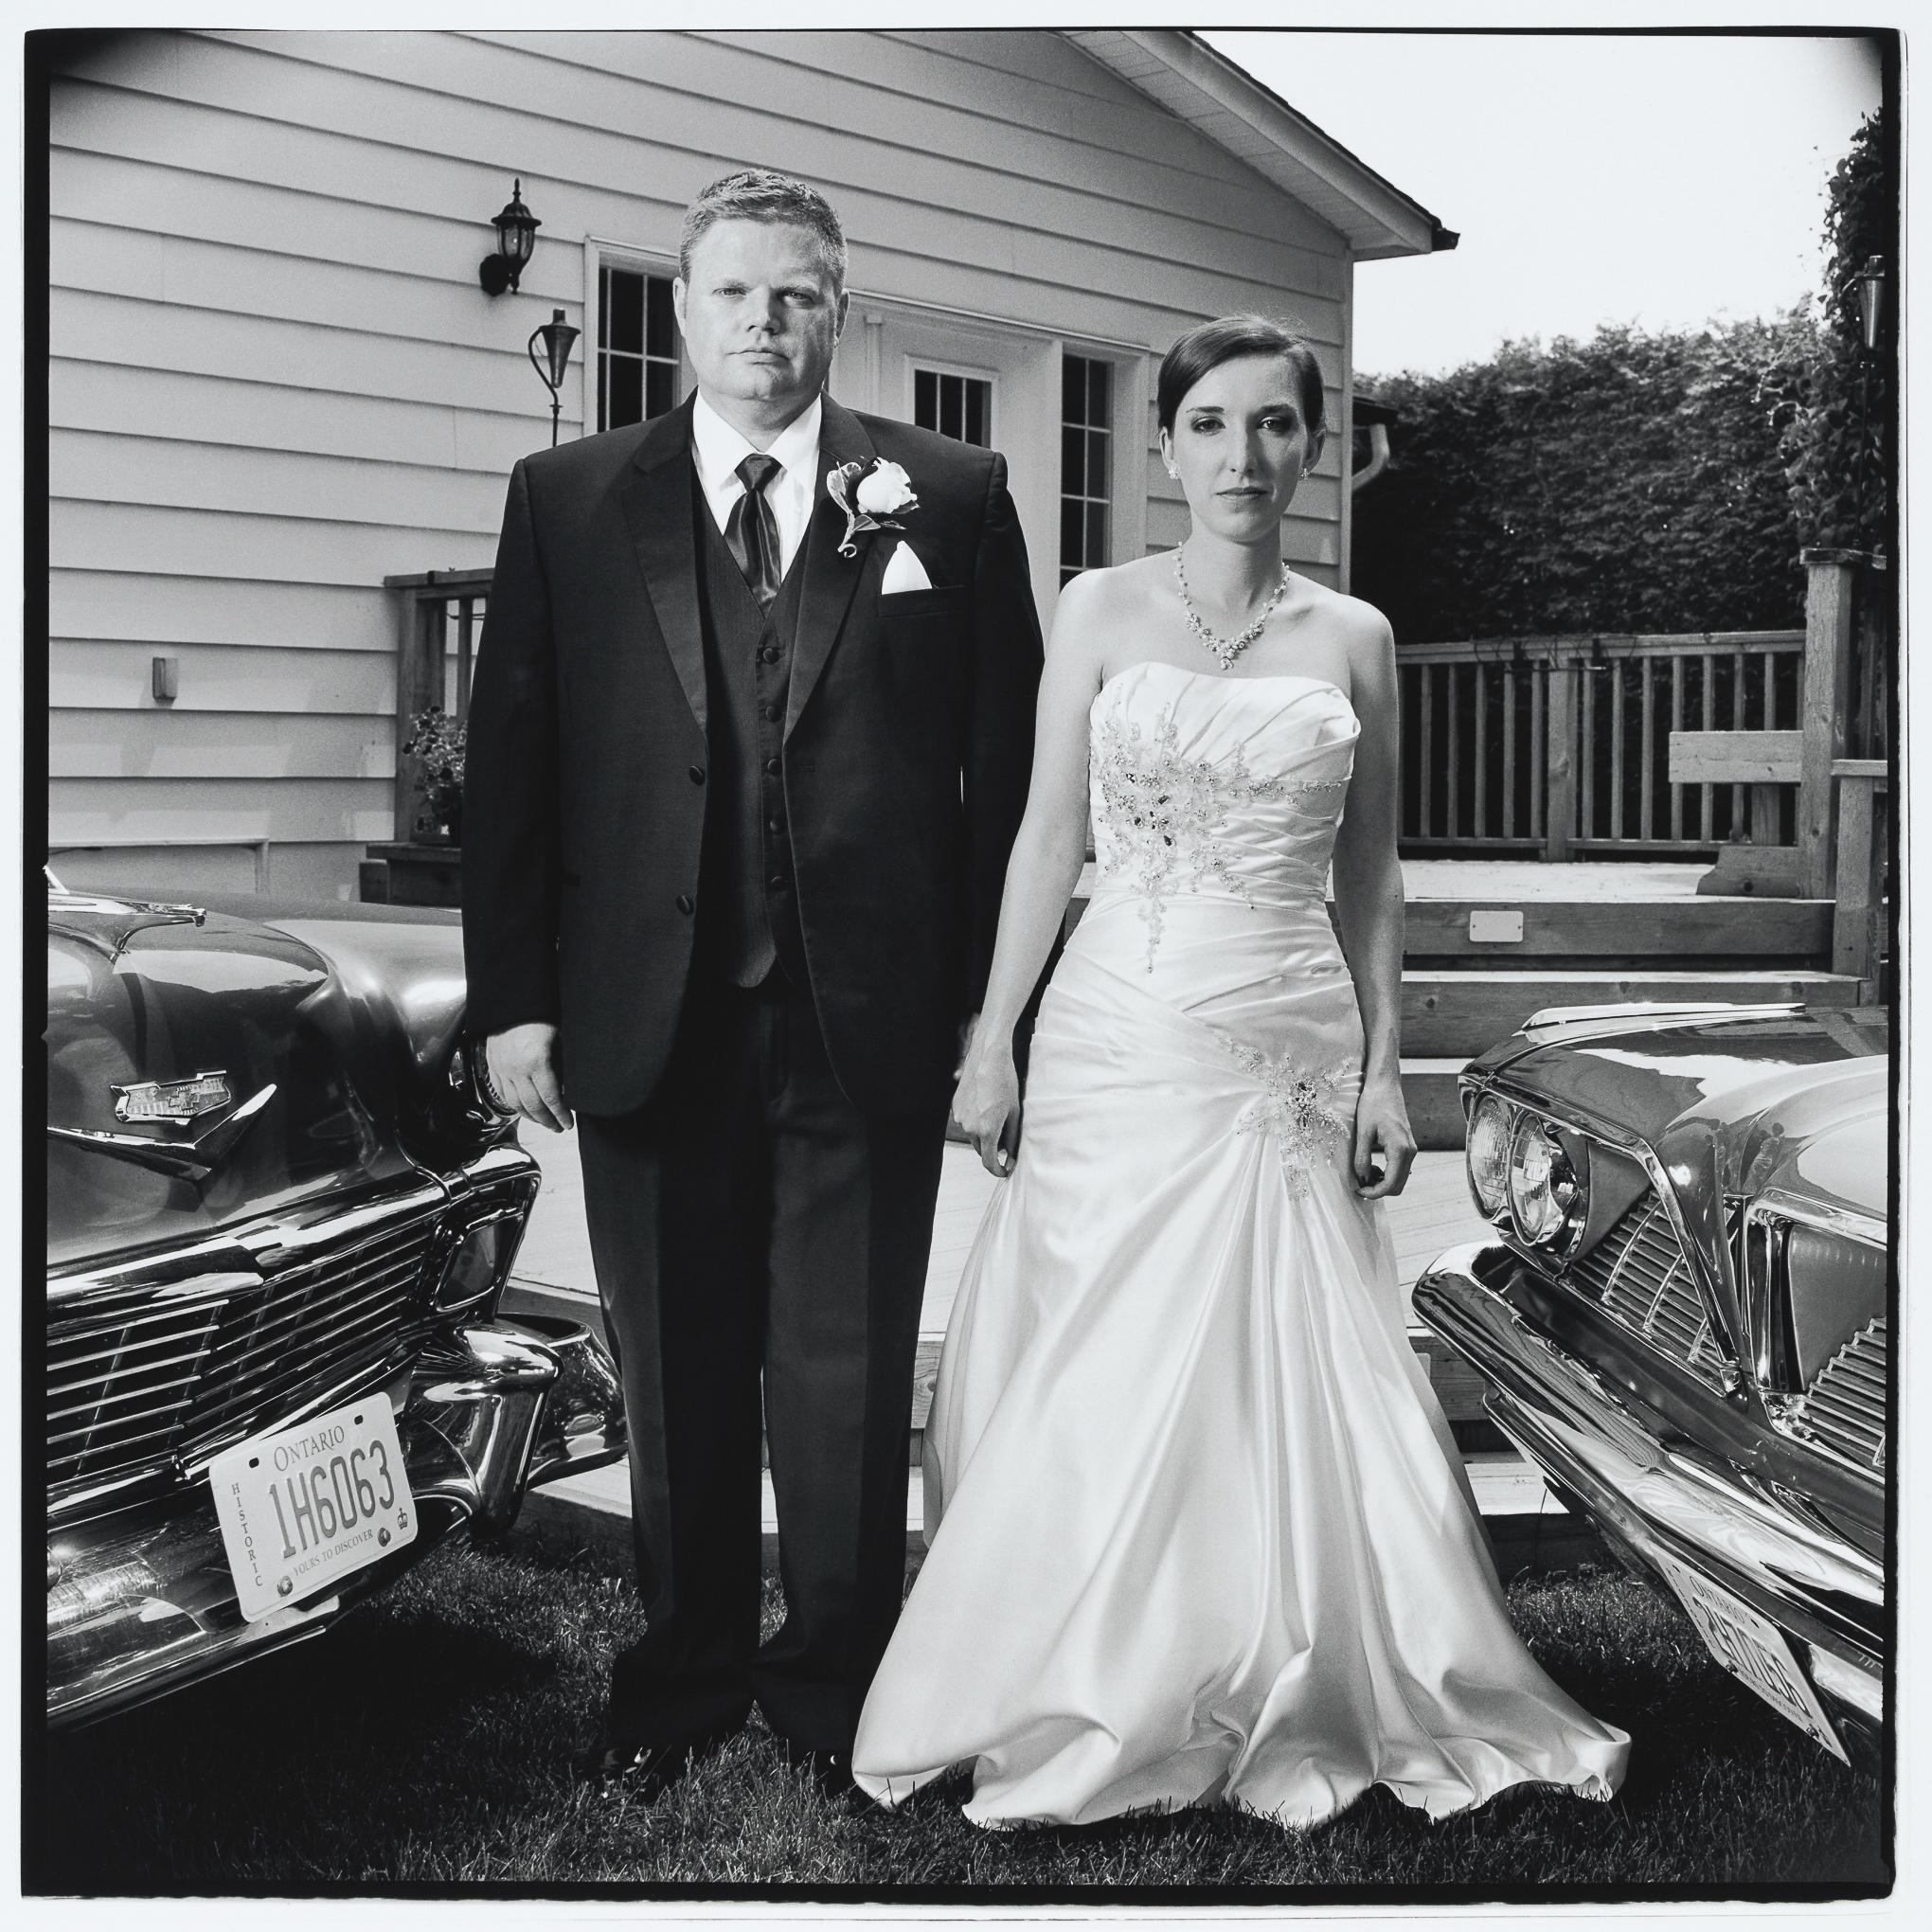 Gregory Hertel, Wedding Day, 2020